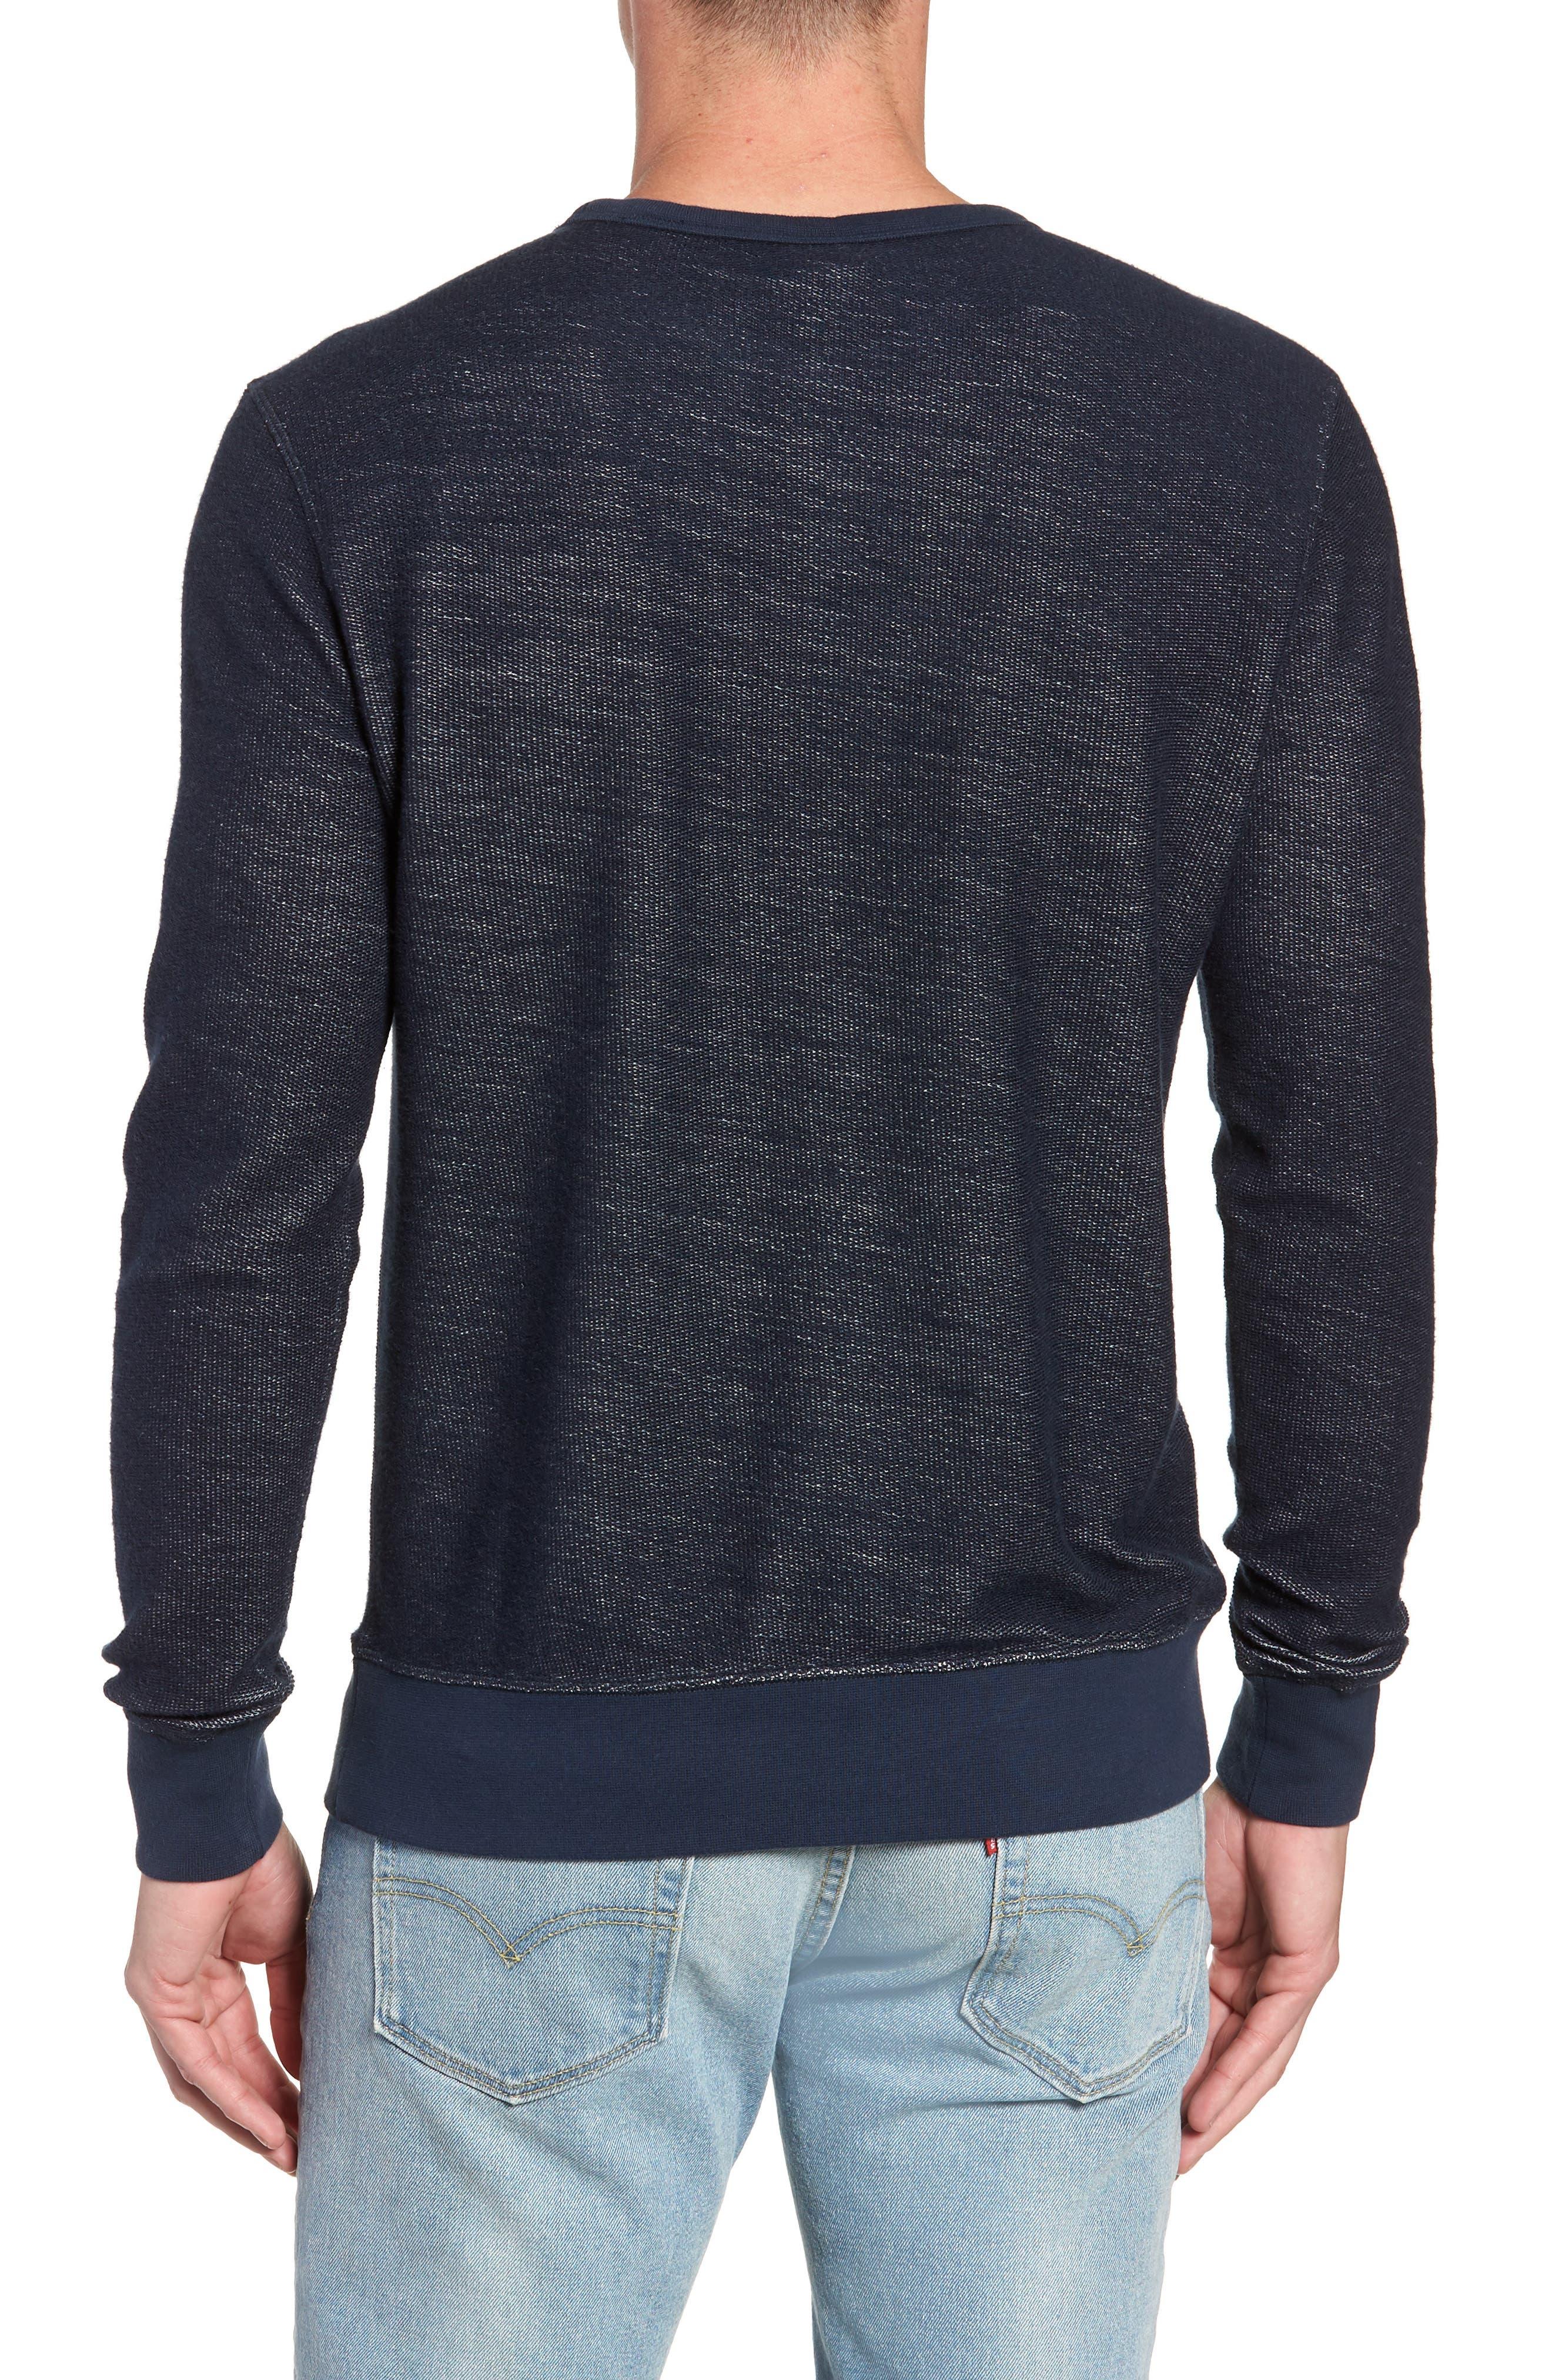 Reversible Colorblock Terry Sweatshirt,                             Alternate thumbnail 2, color,                             Navy / Grey